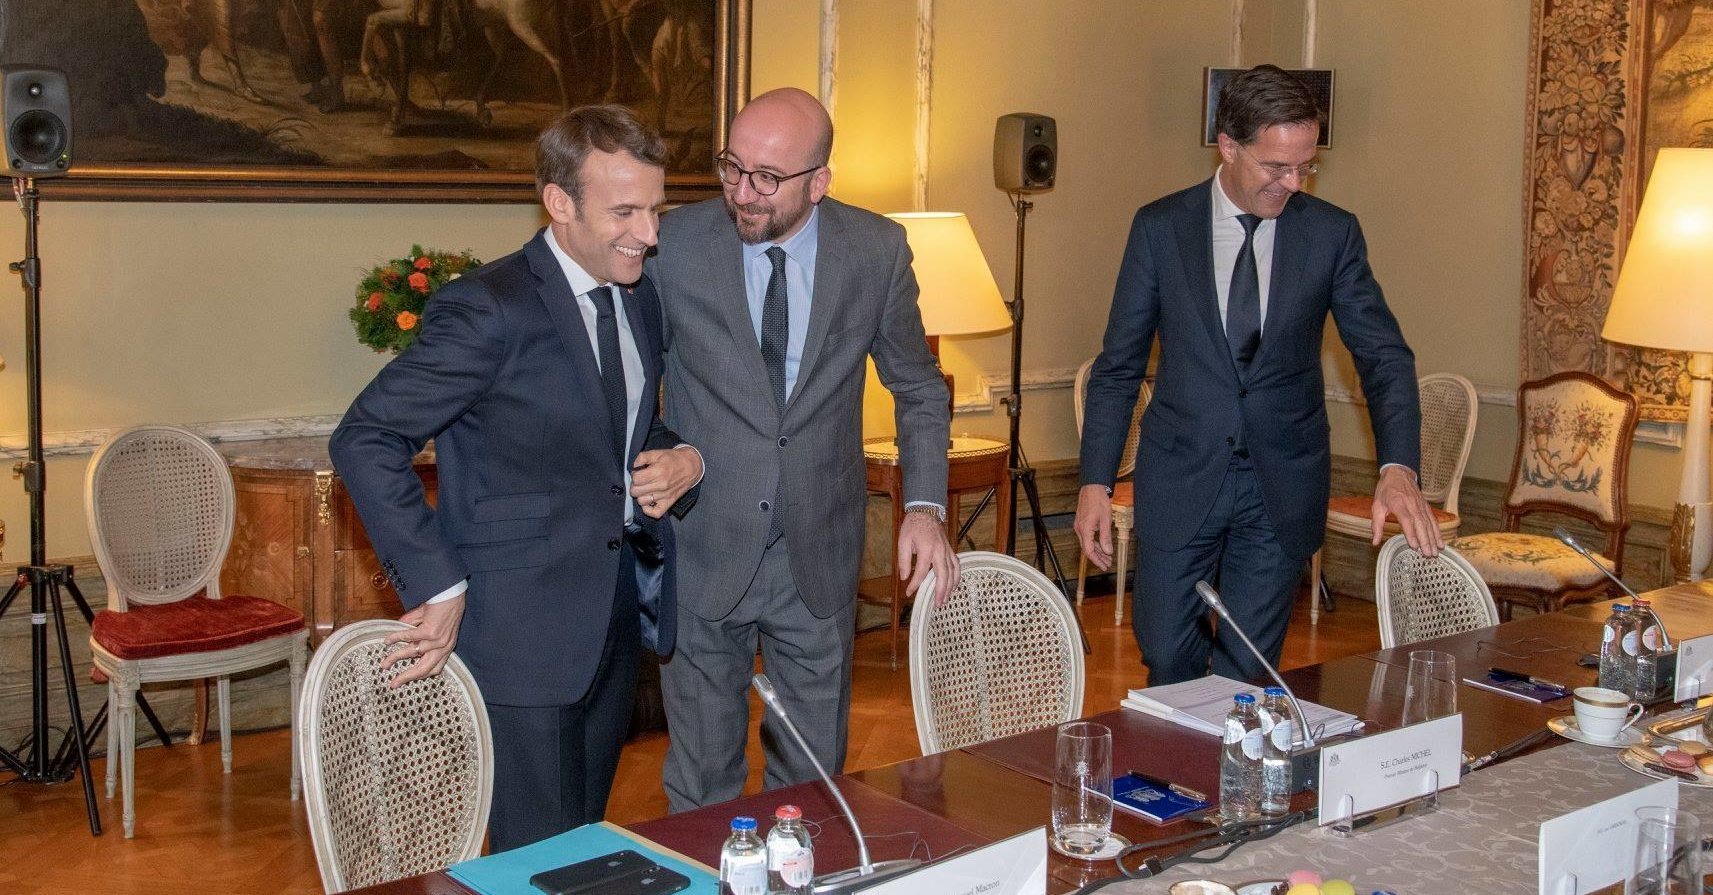 Macron Michel Rutte